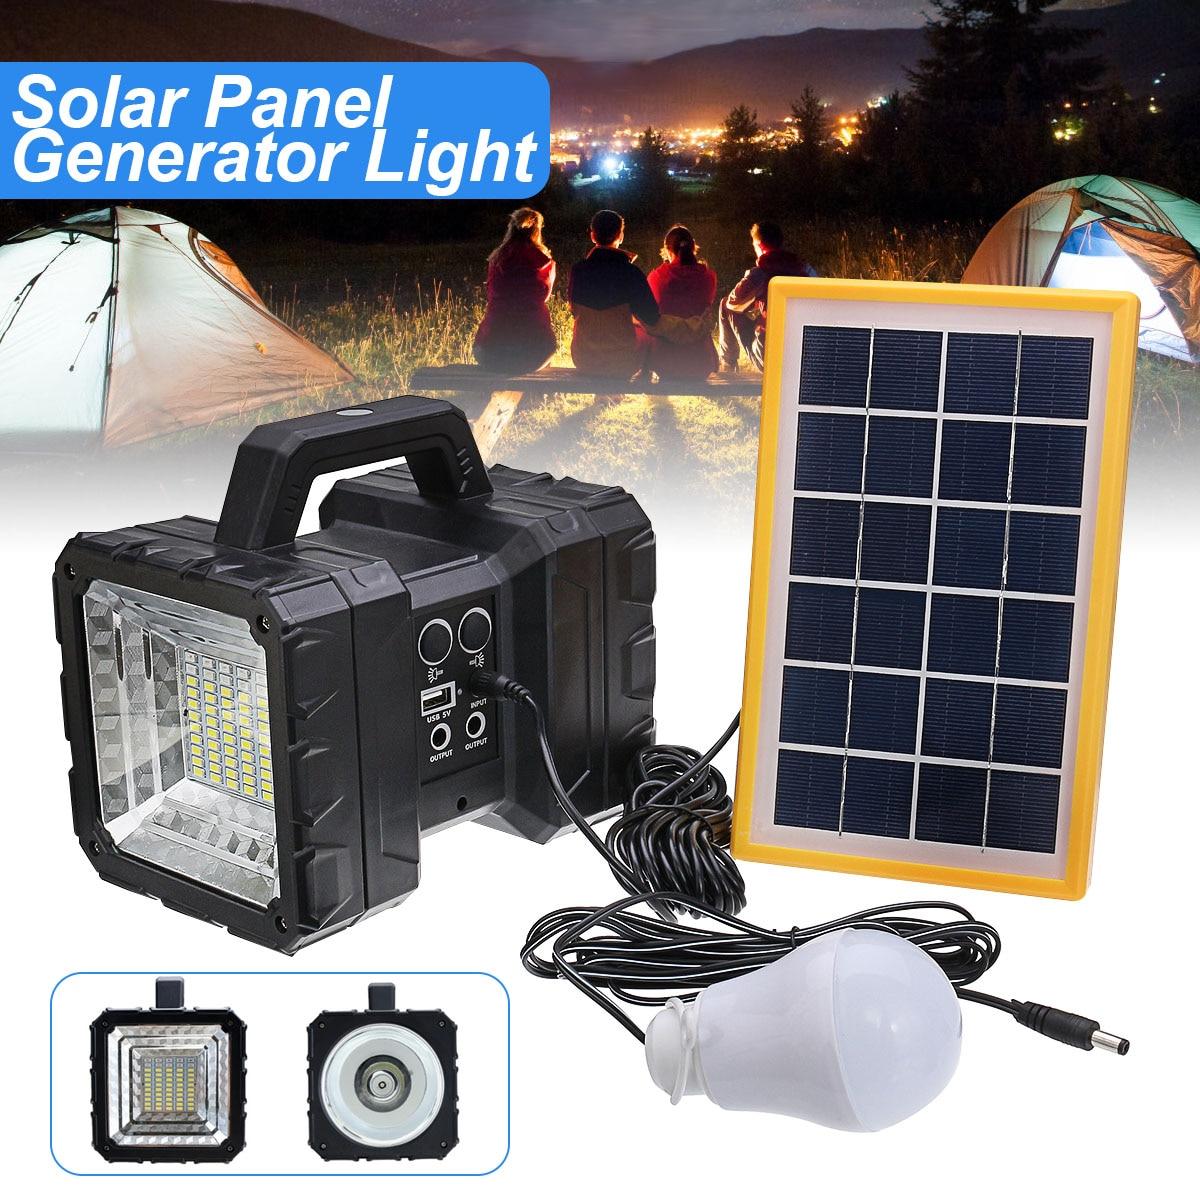 Soldonweb Home Solar Power And Led Lighting: Portable Solar Panels Charging Generator Power System